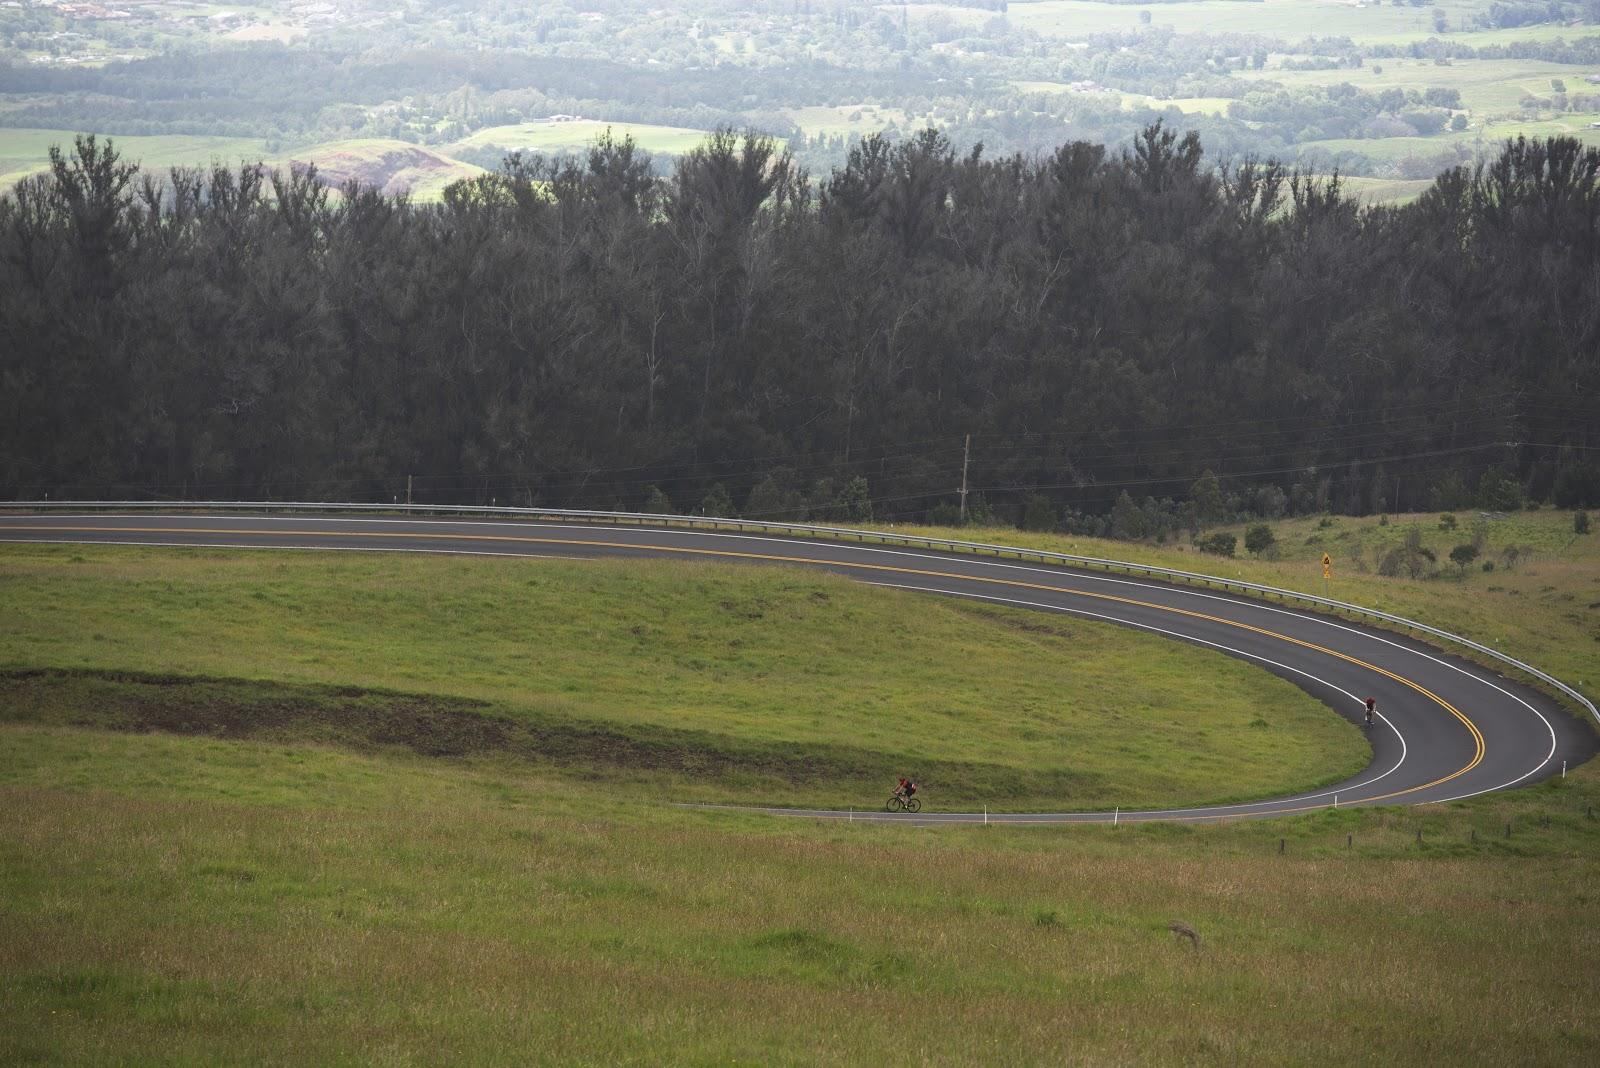 Climbing Haleakala Volcano  by bike - road altitude markers, roadway, clouds and bike